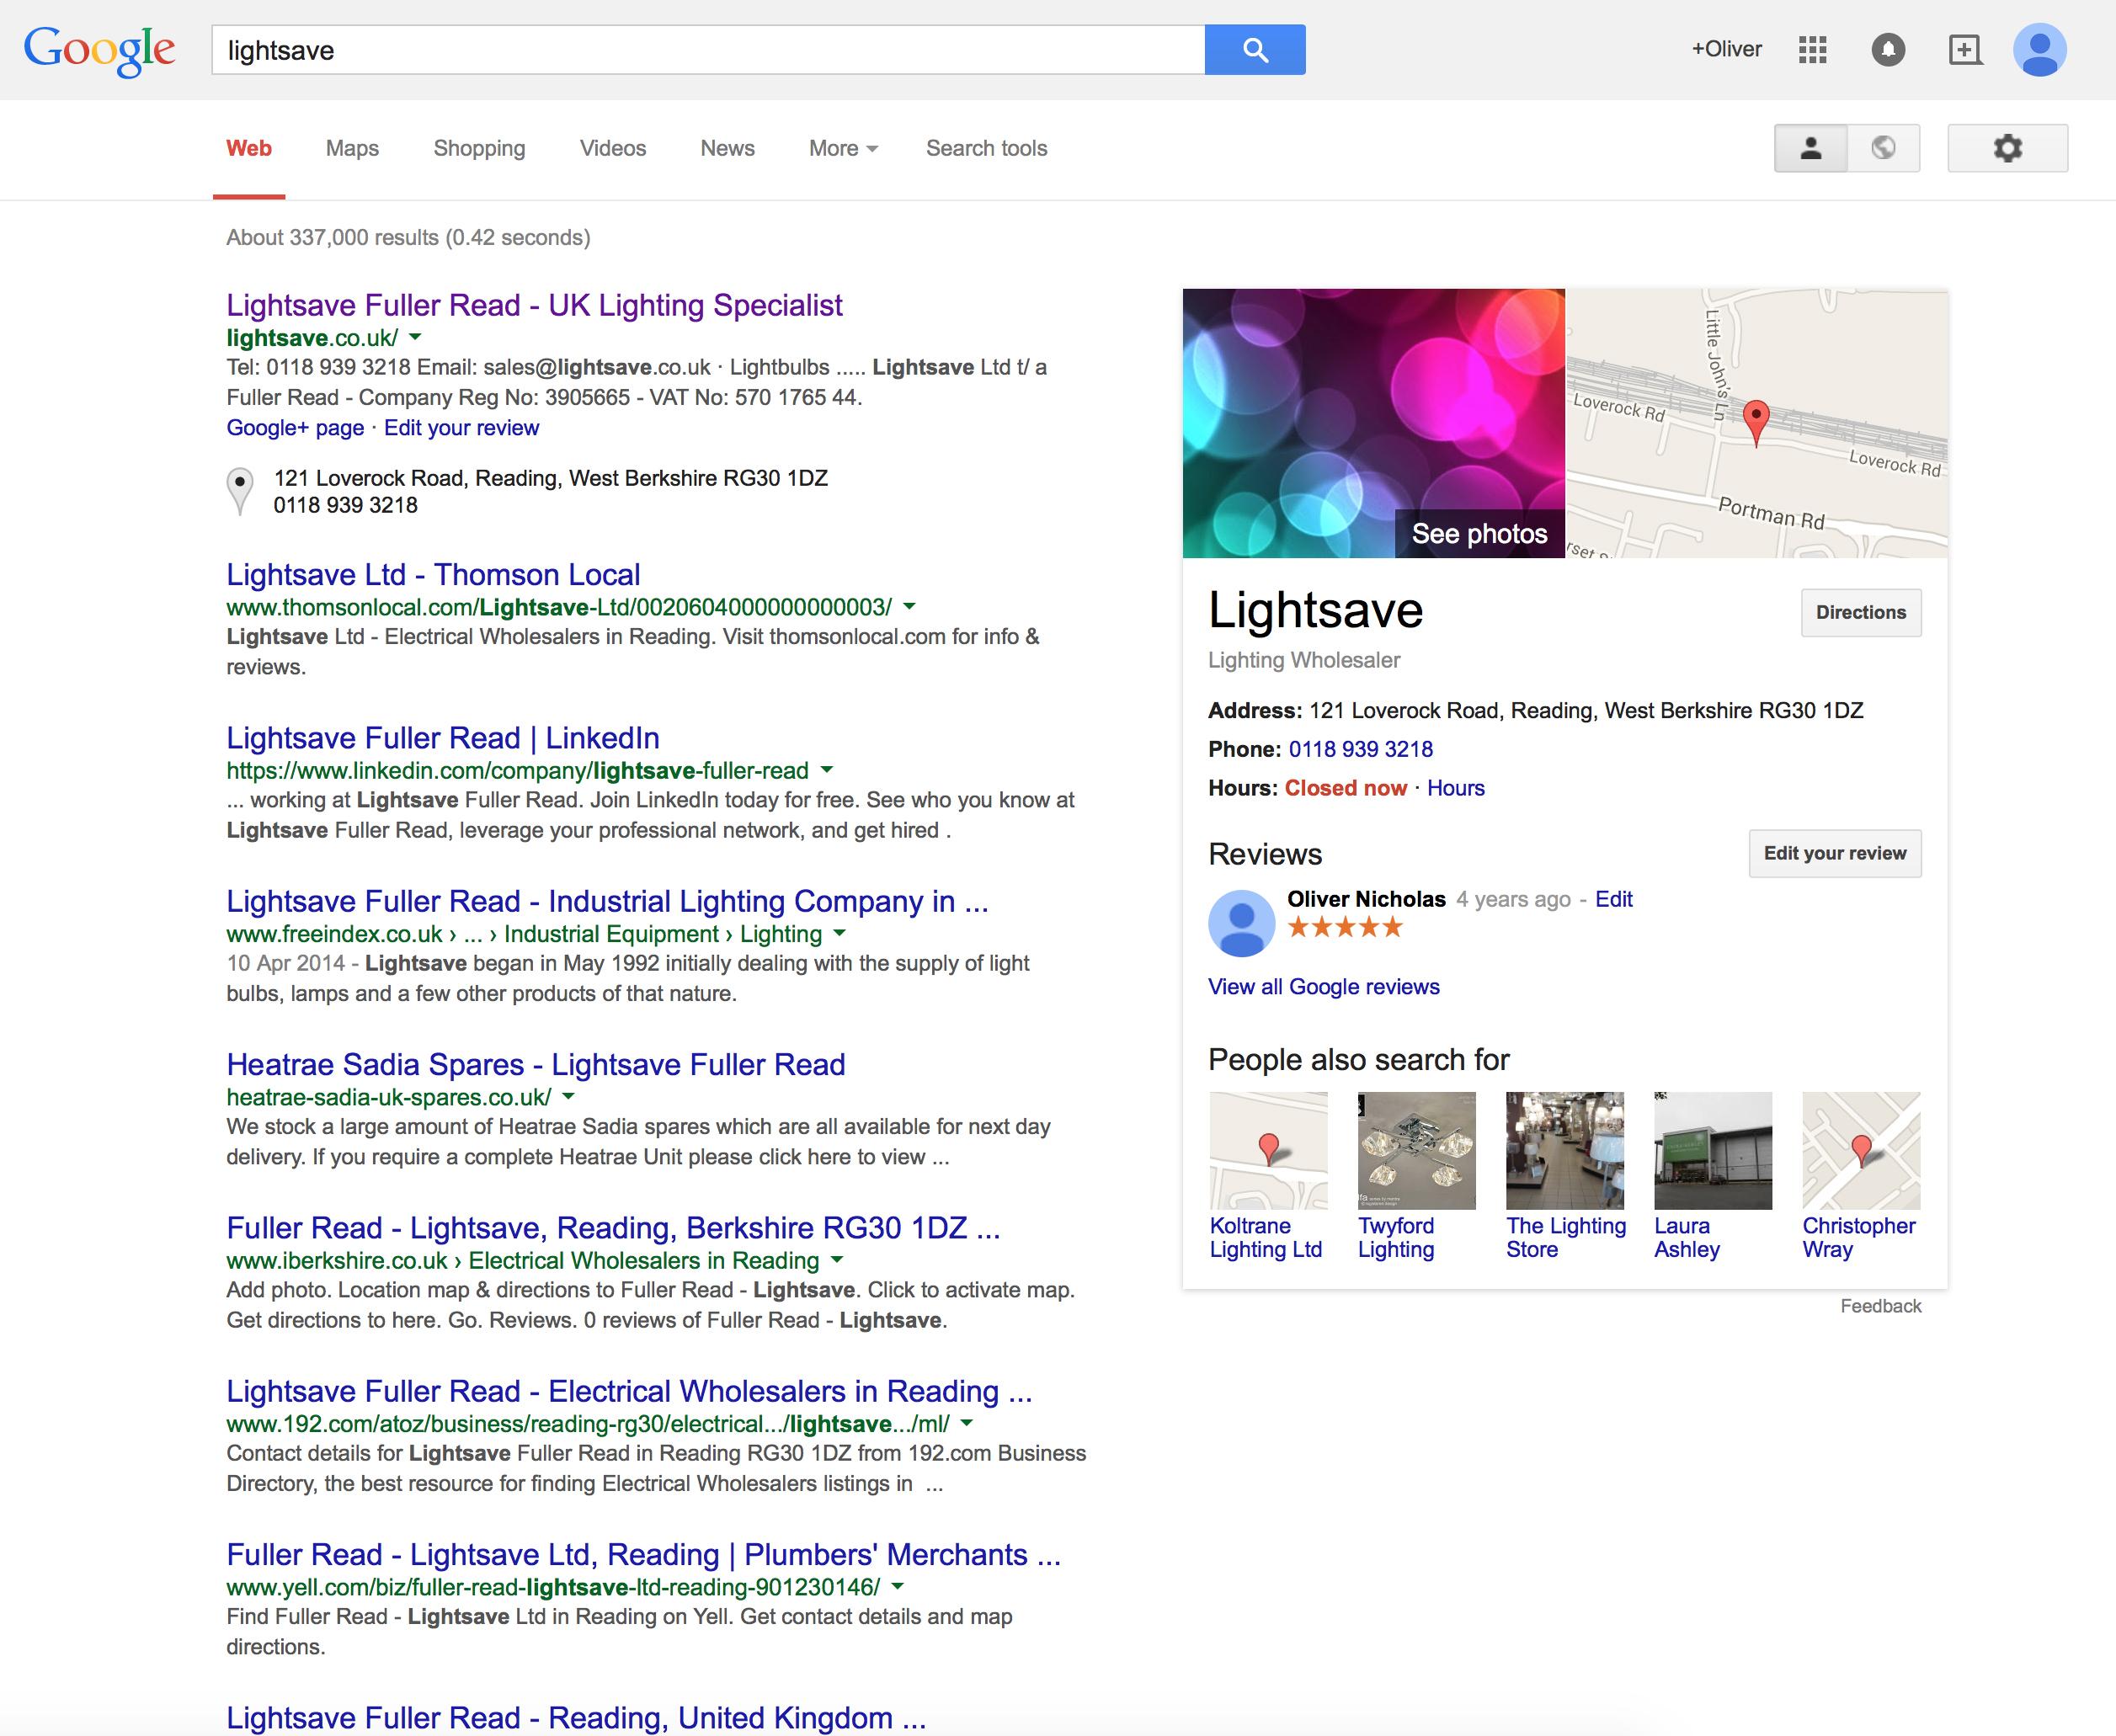 lightsave-google-search